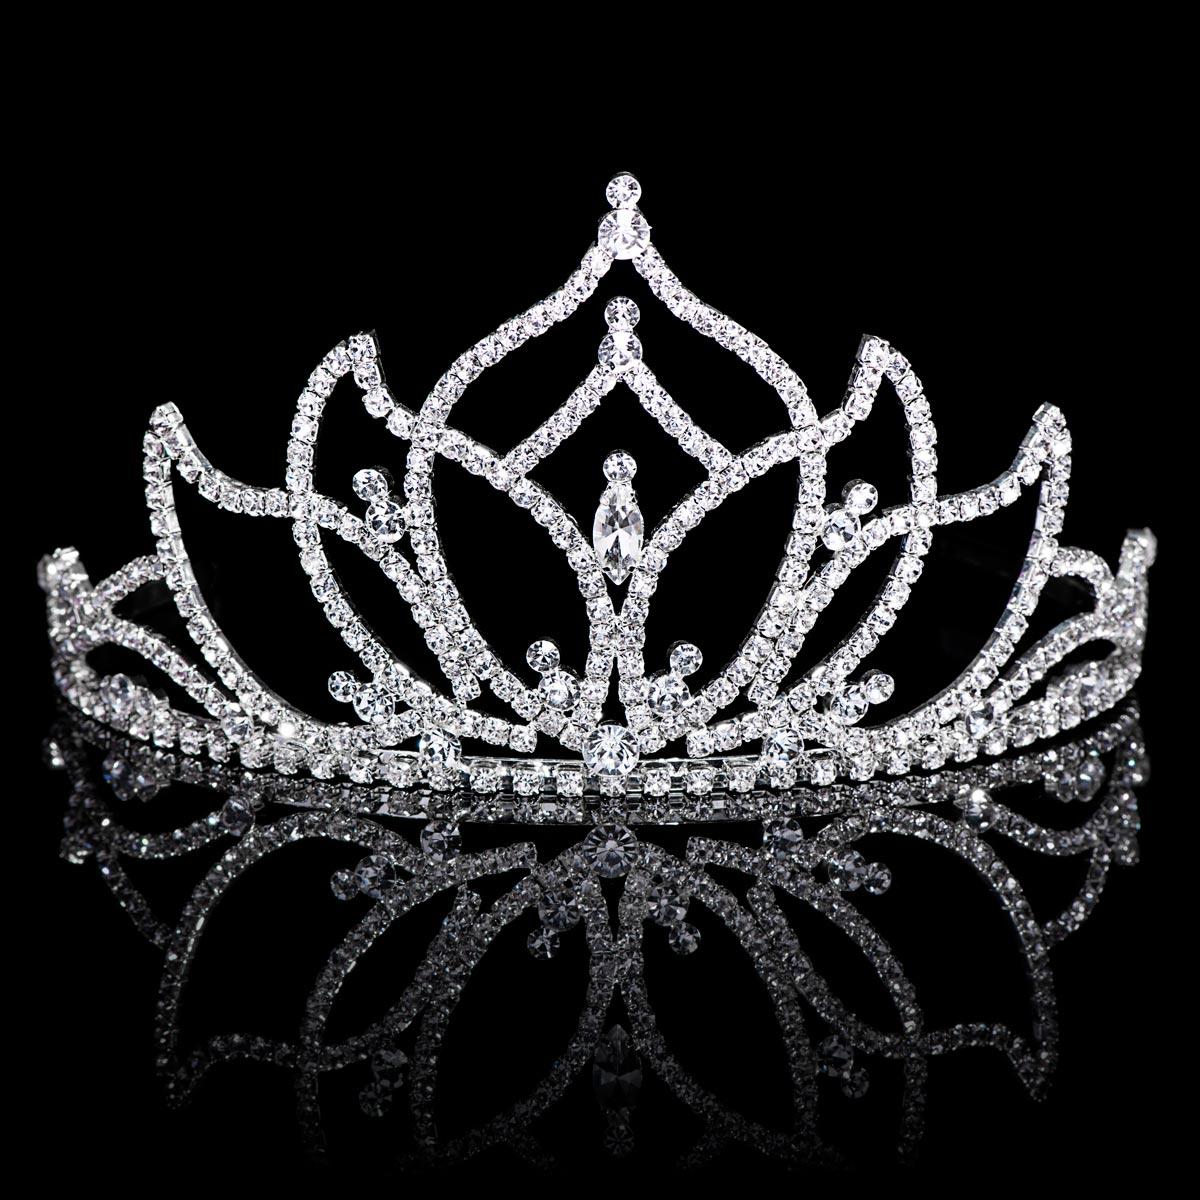 Prom Bridesmaid Bride The ELVIRA Crown Handfasting Alt Wedding Witchy Woodland Gothic Amethyst Tiara Hairband Head-Dress Ritual